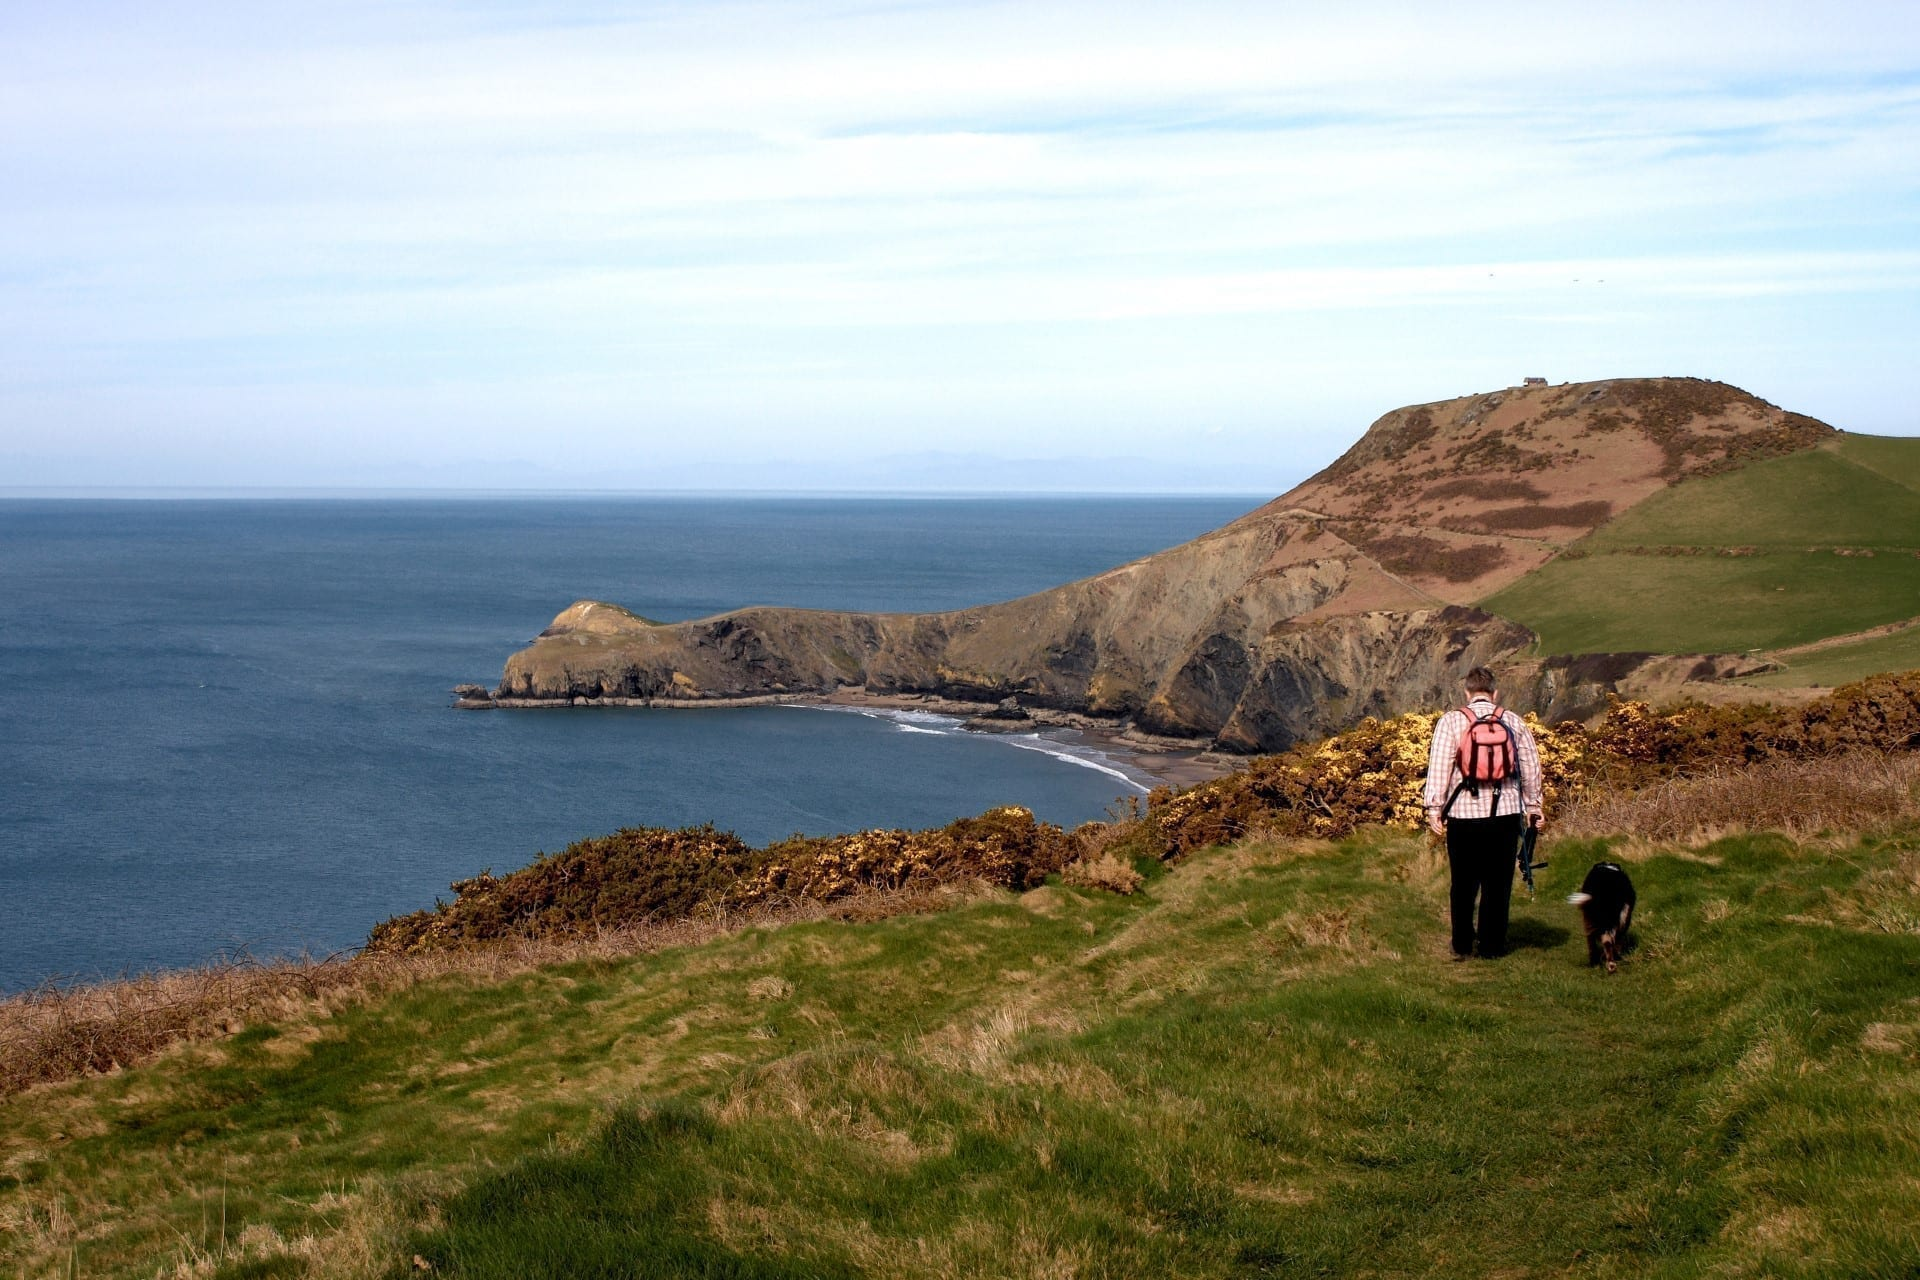 A man and his dog walking along the welsh coastal path